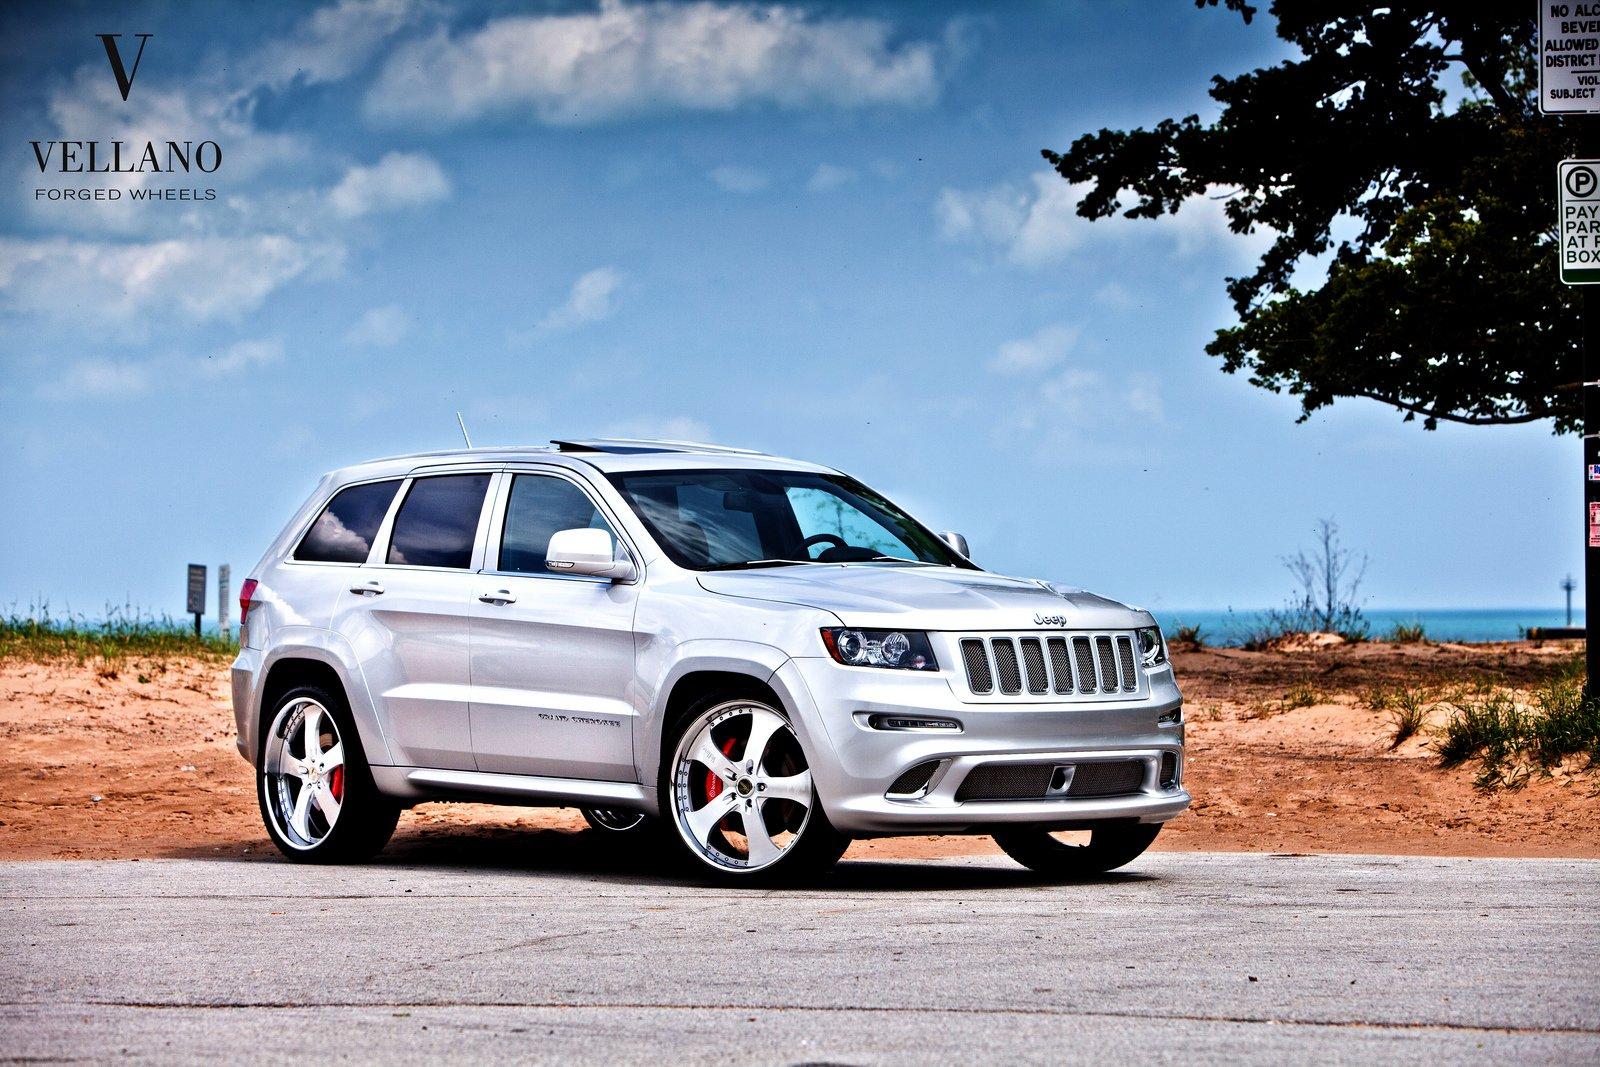 jeep grand cherokee srt8 grey vellano wheels tuning cars. Black Bedroom Furniture Sets. Home Design Ideas